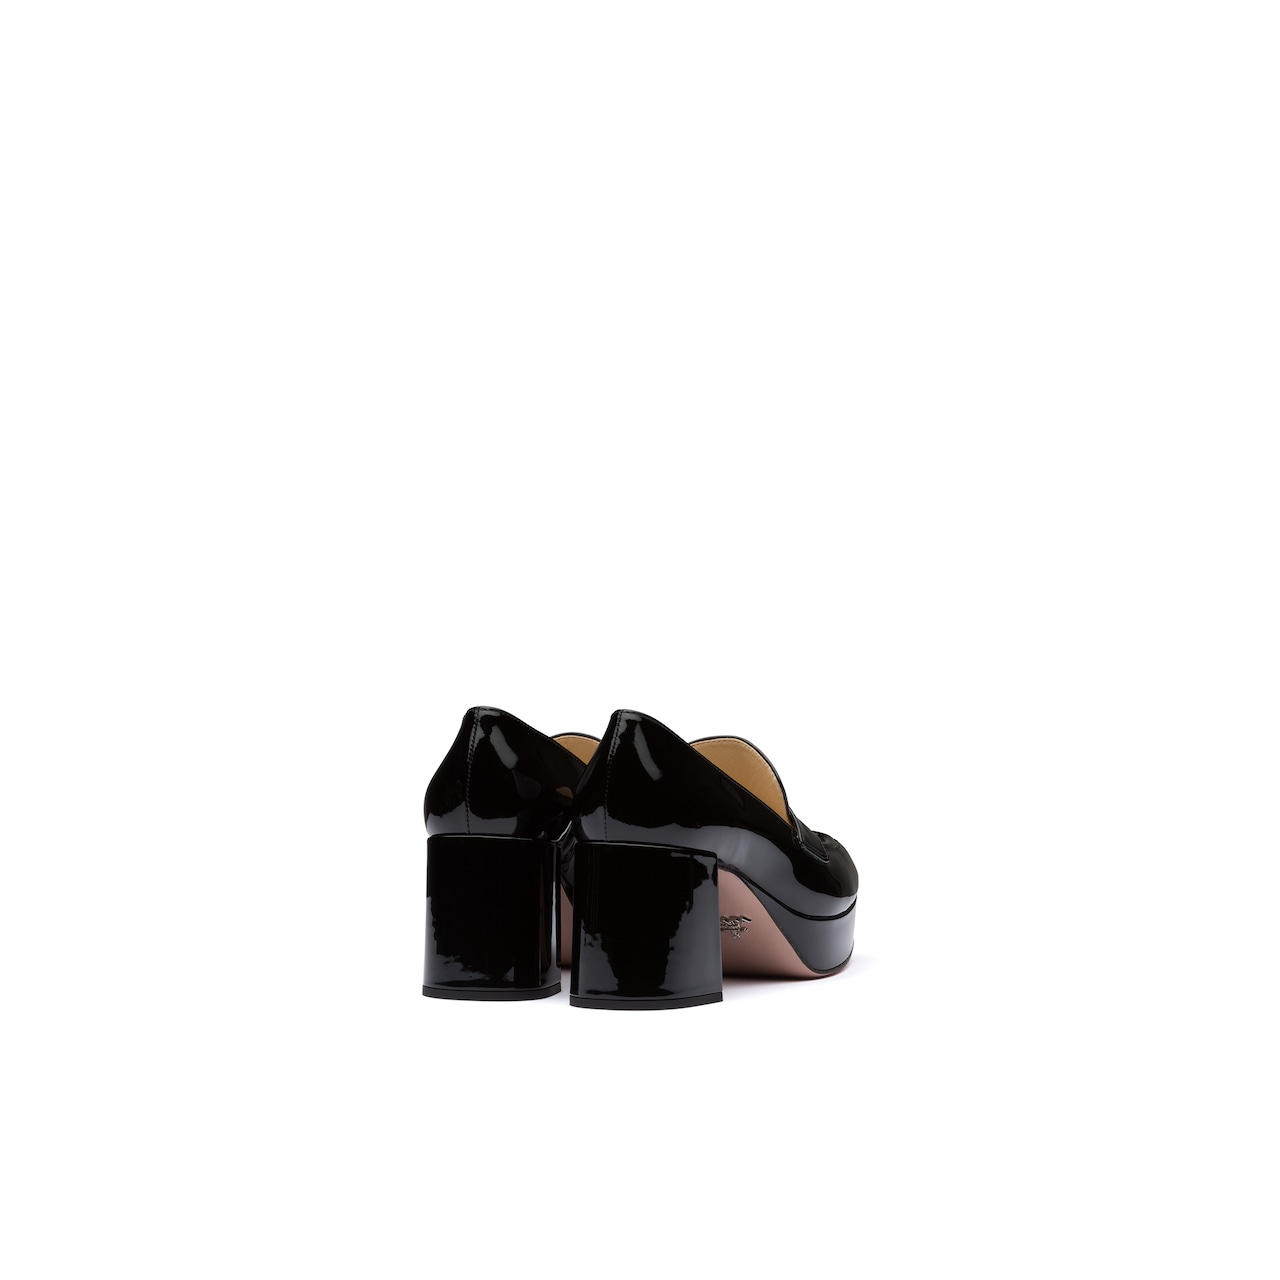 Prada 漆皮厚底乐福鞋 5